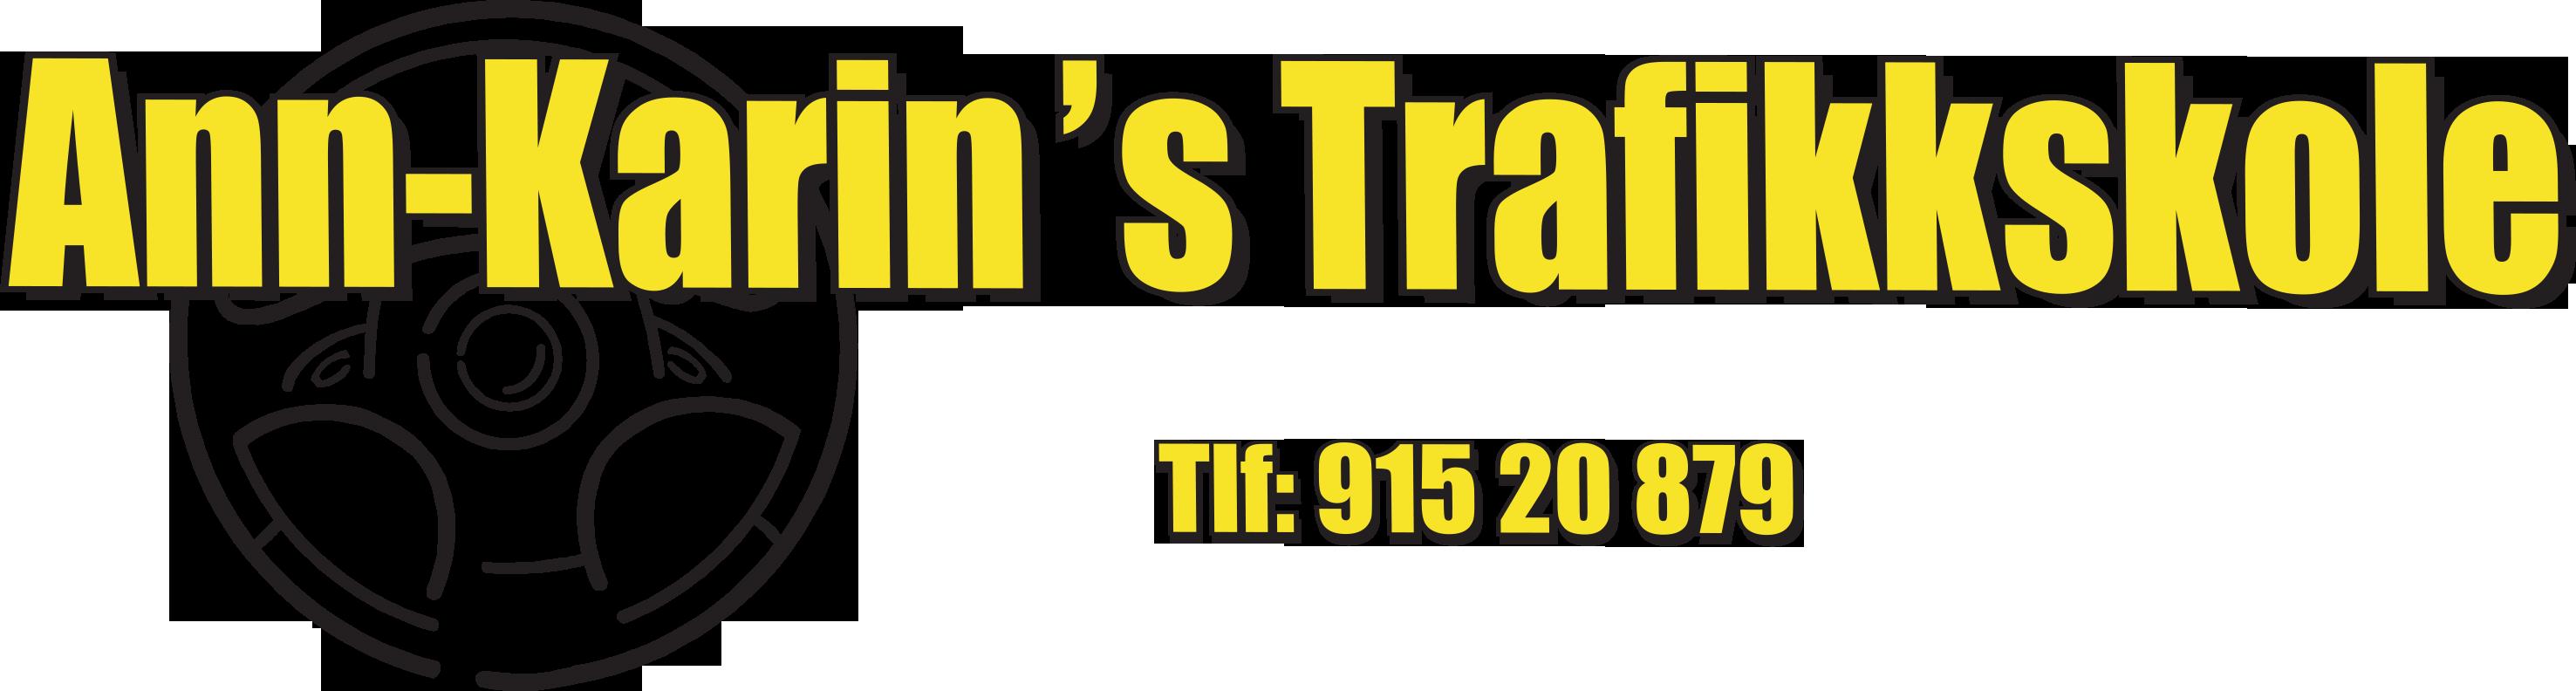 Ann-Karin's Trafikkskole